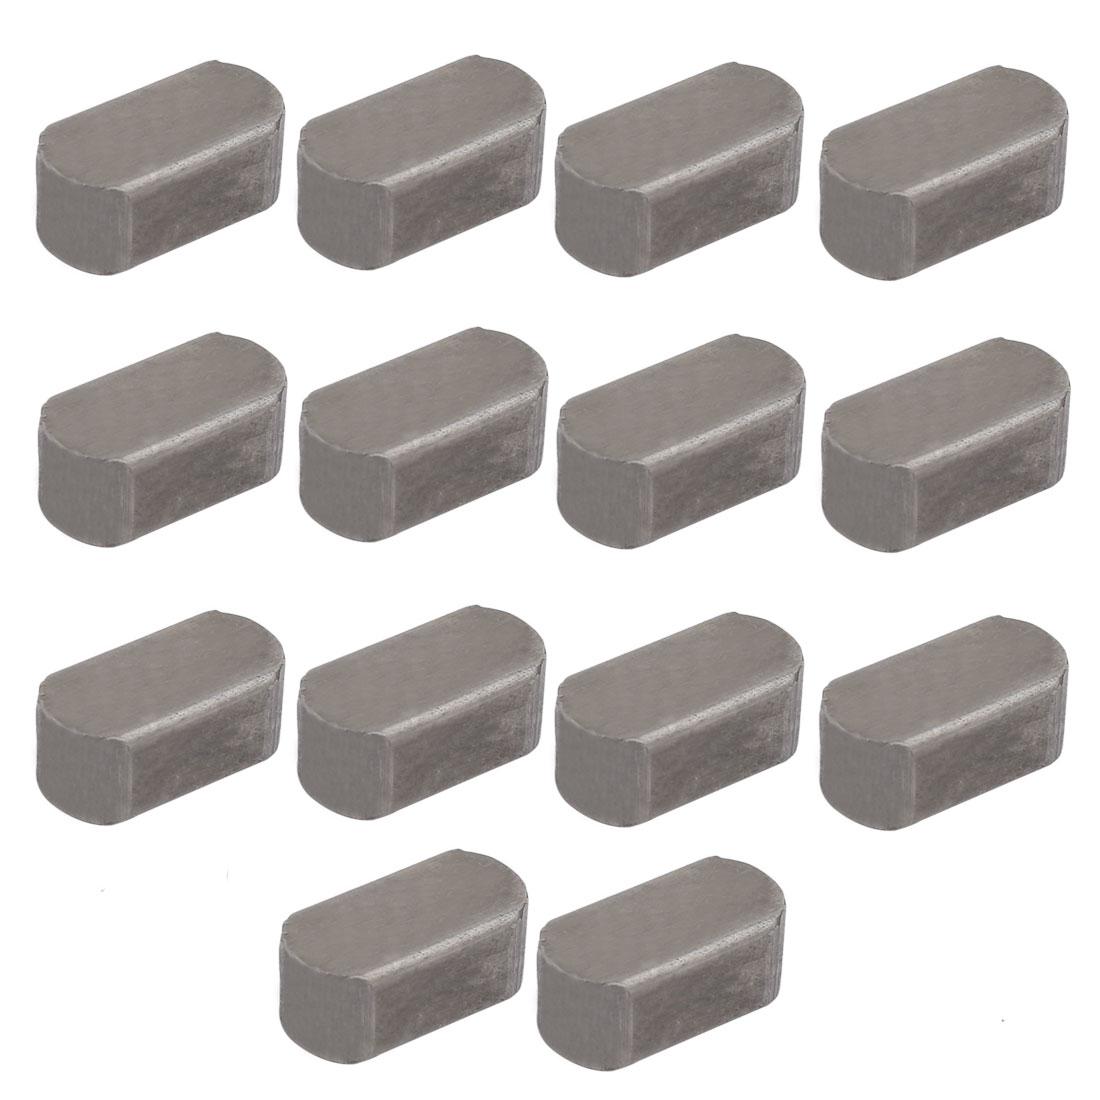 20mmx10mmx8mm Carbon Steel Key Stock To Lock Pulleys 14pcs